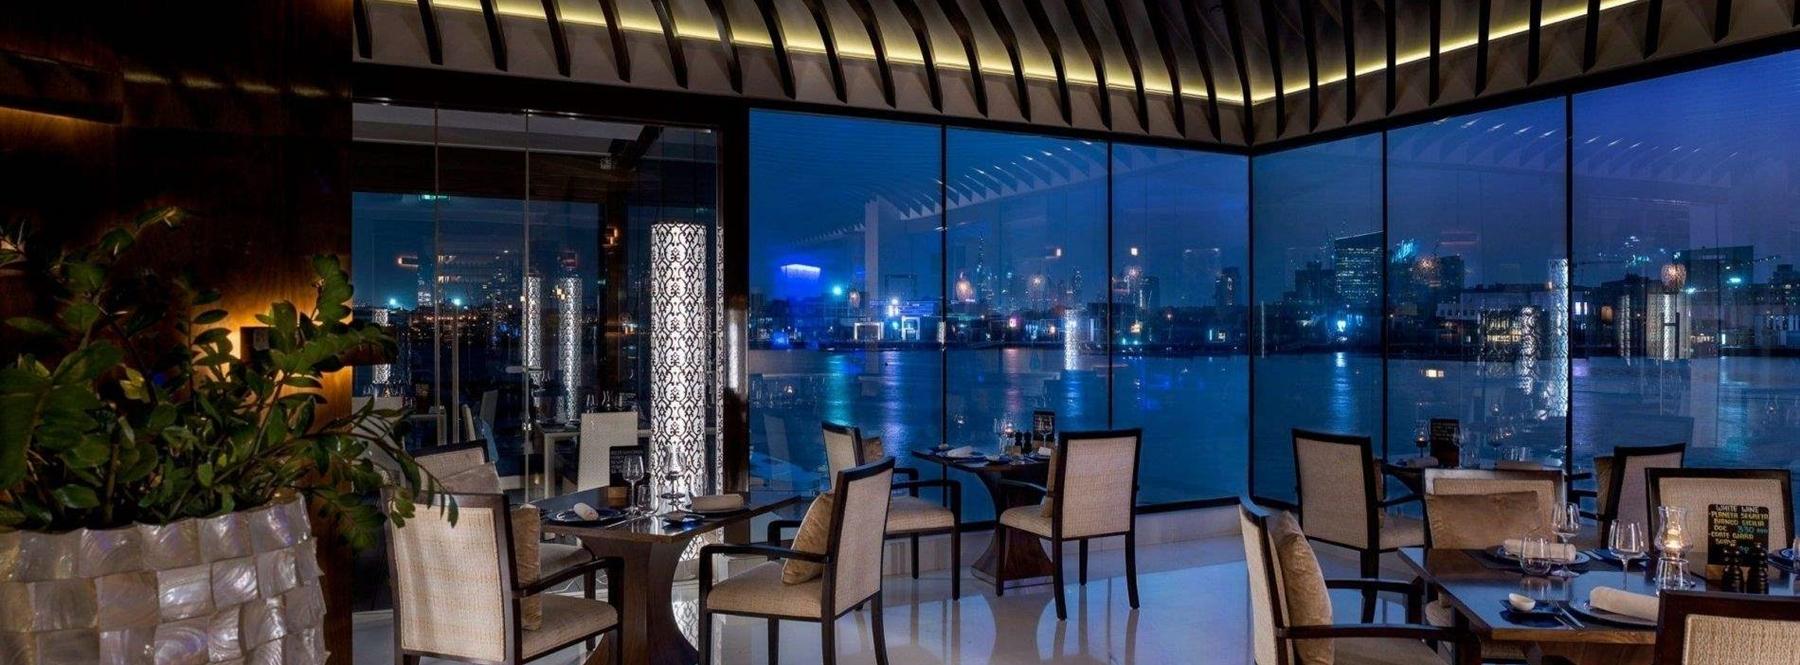 Italian Restaurant in Dubai Vivaldi